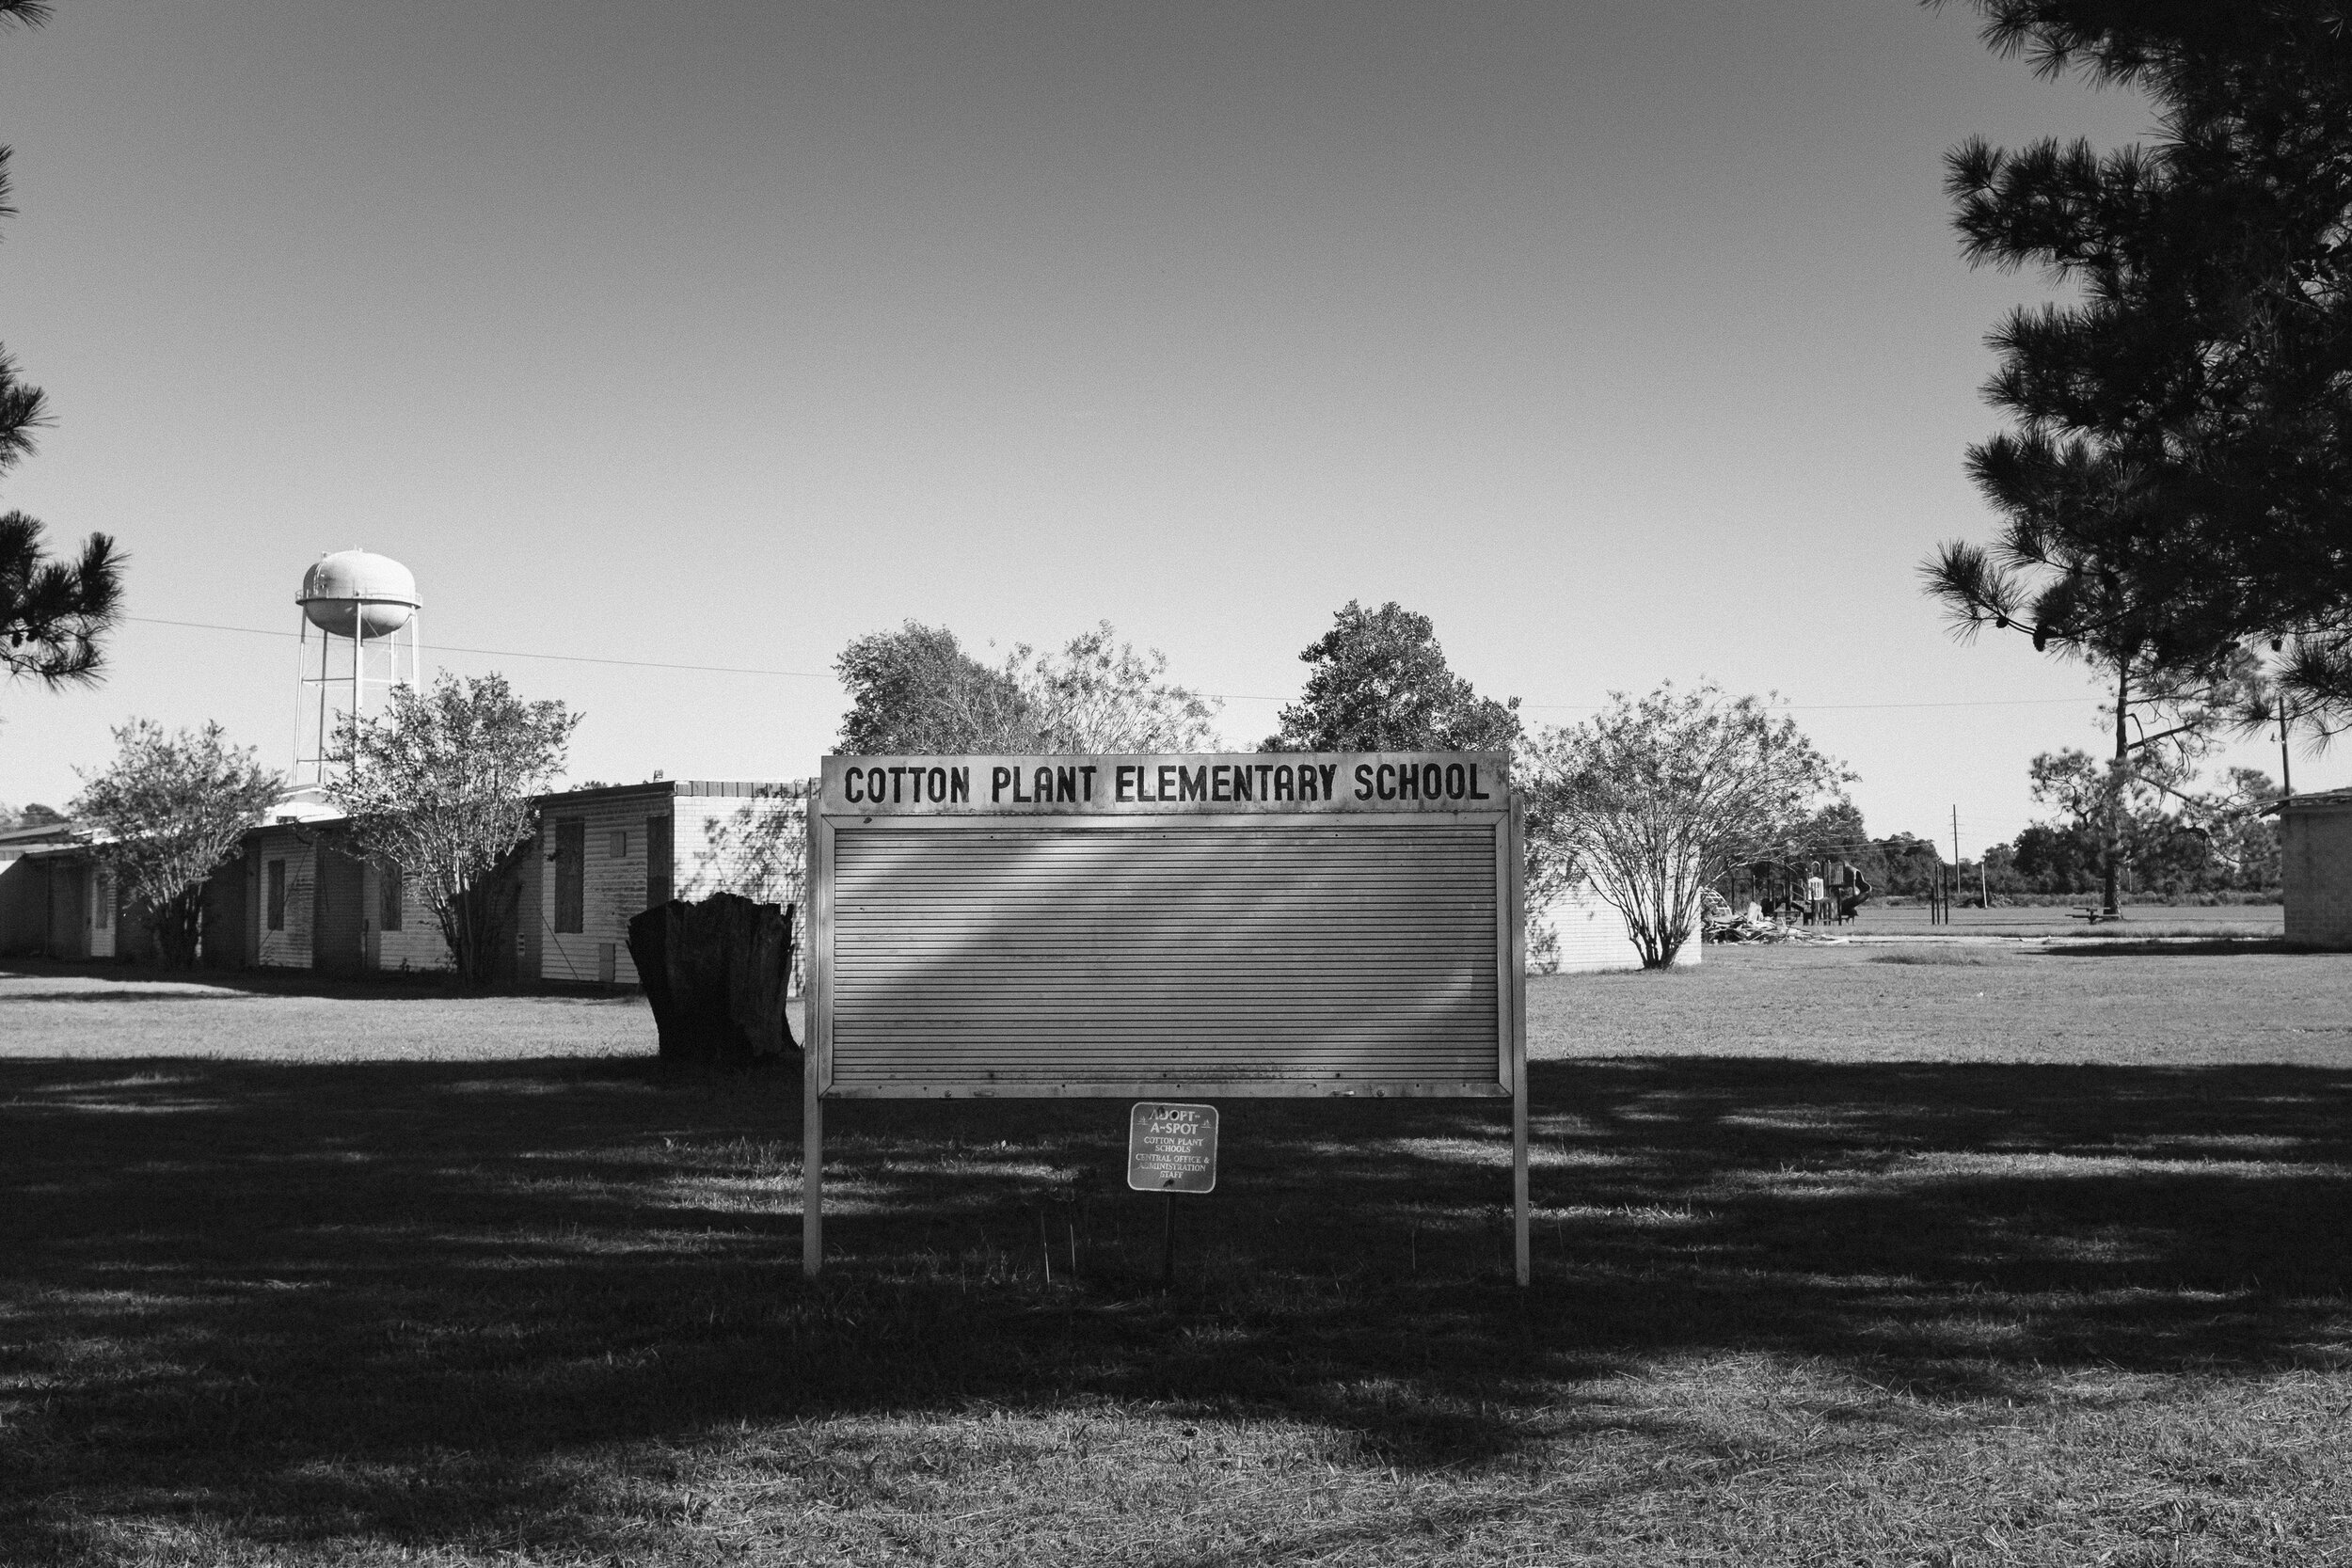 Cotton Plant Elementary School Cotton Plant, AR